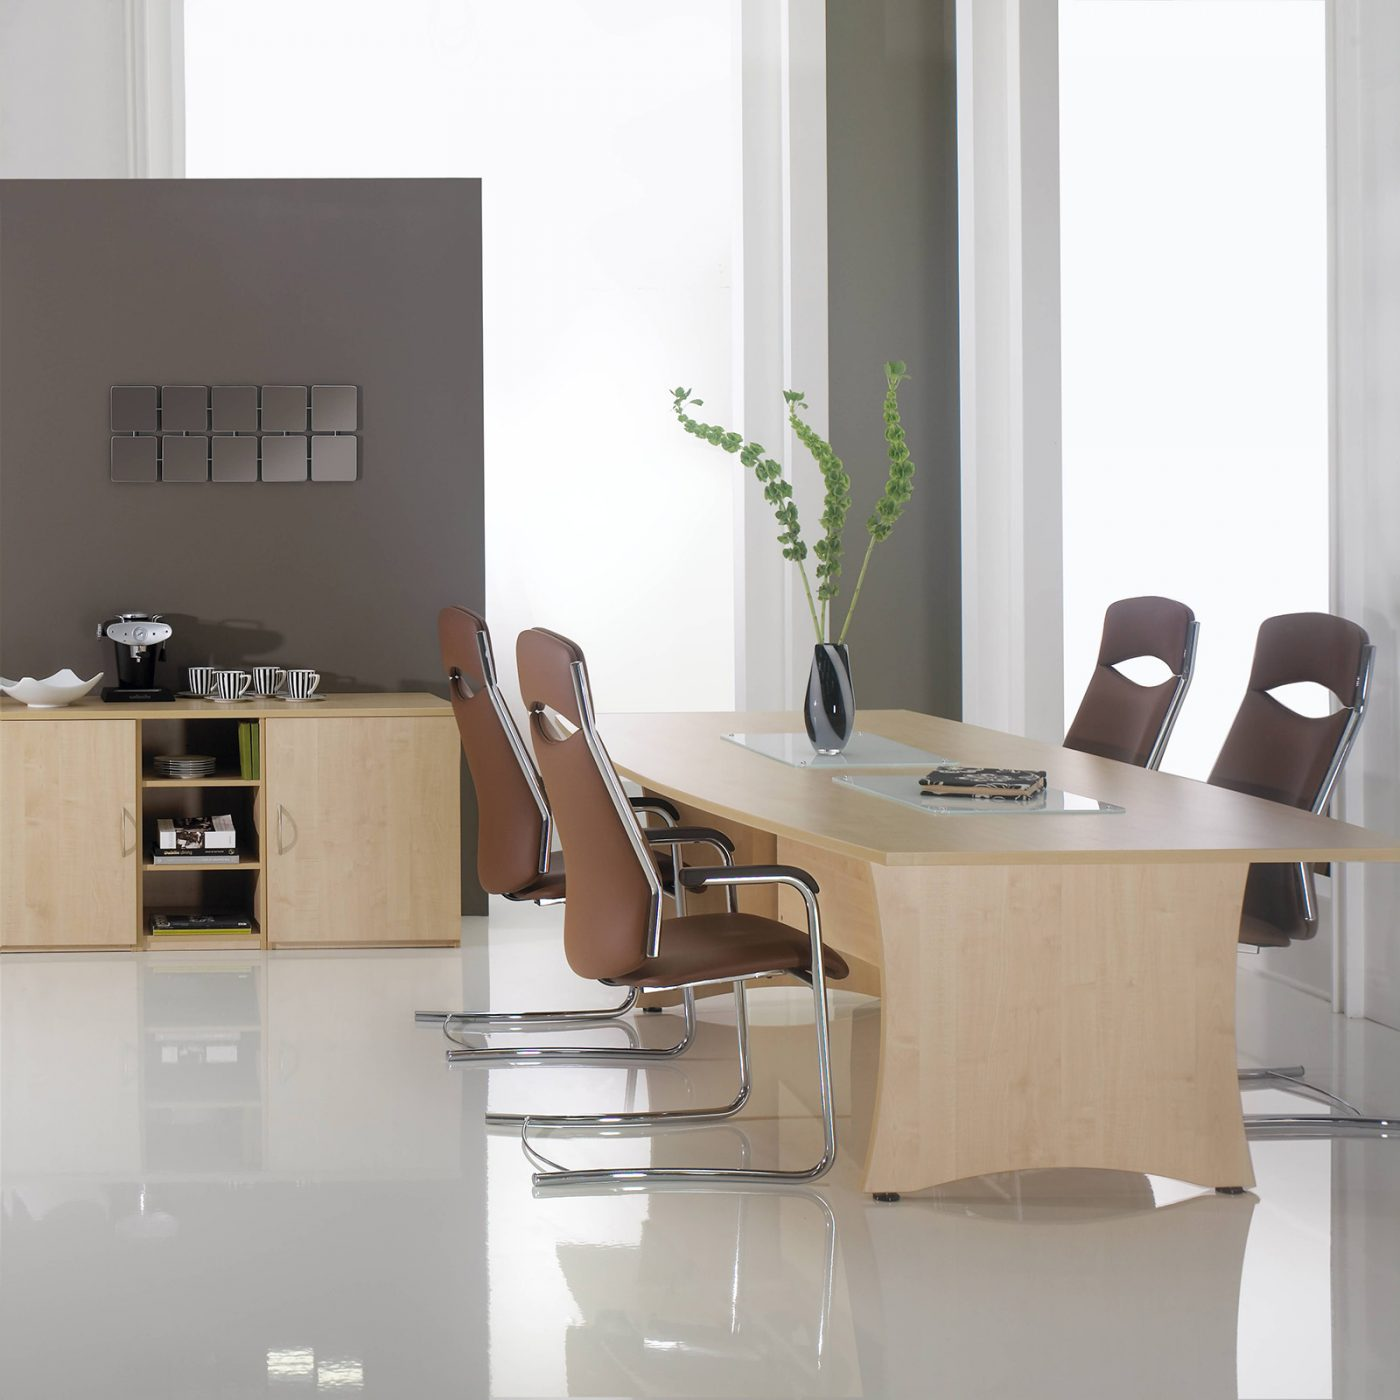 roma lorenzo, boardroom table, meeting table, MFC